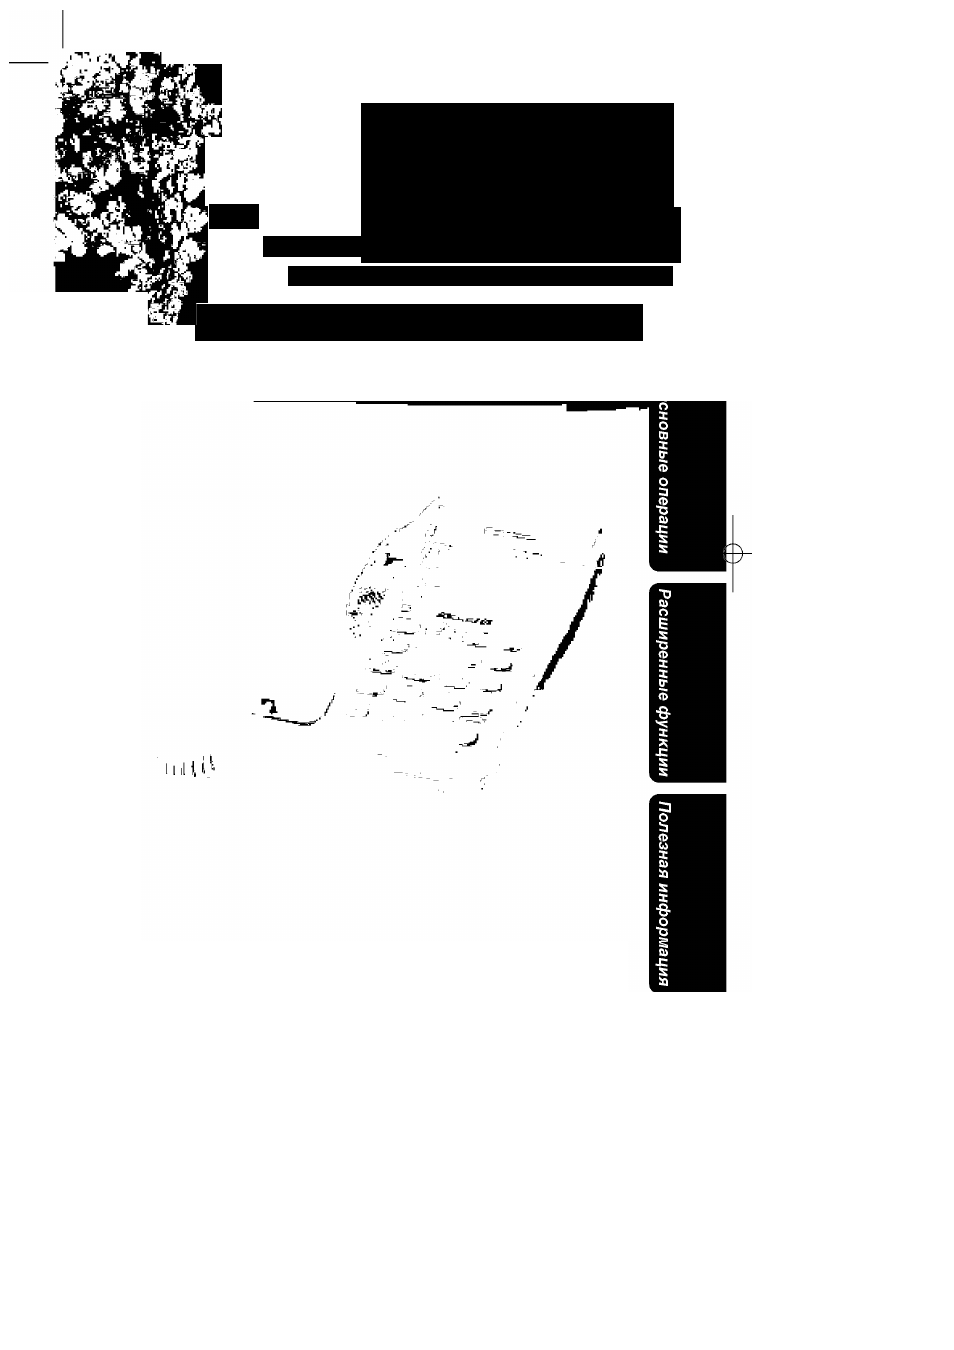 Panasonic Kx Ts2363ruw инструкция на русском - картинка 1